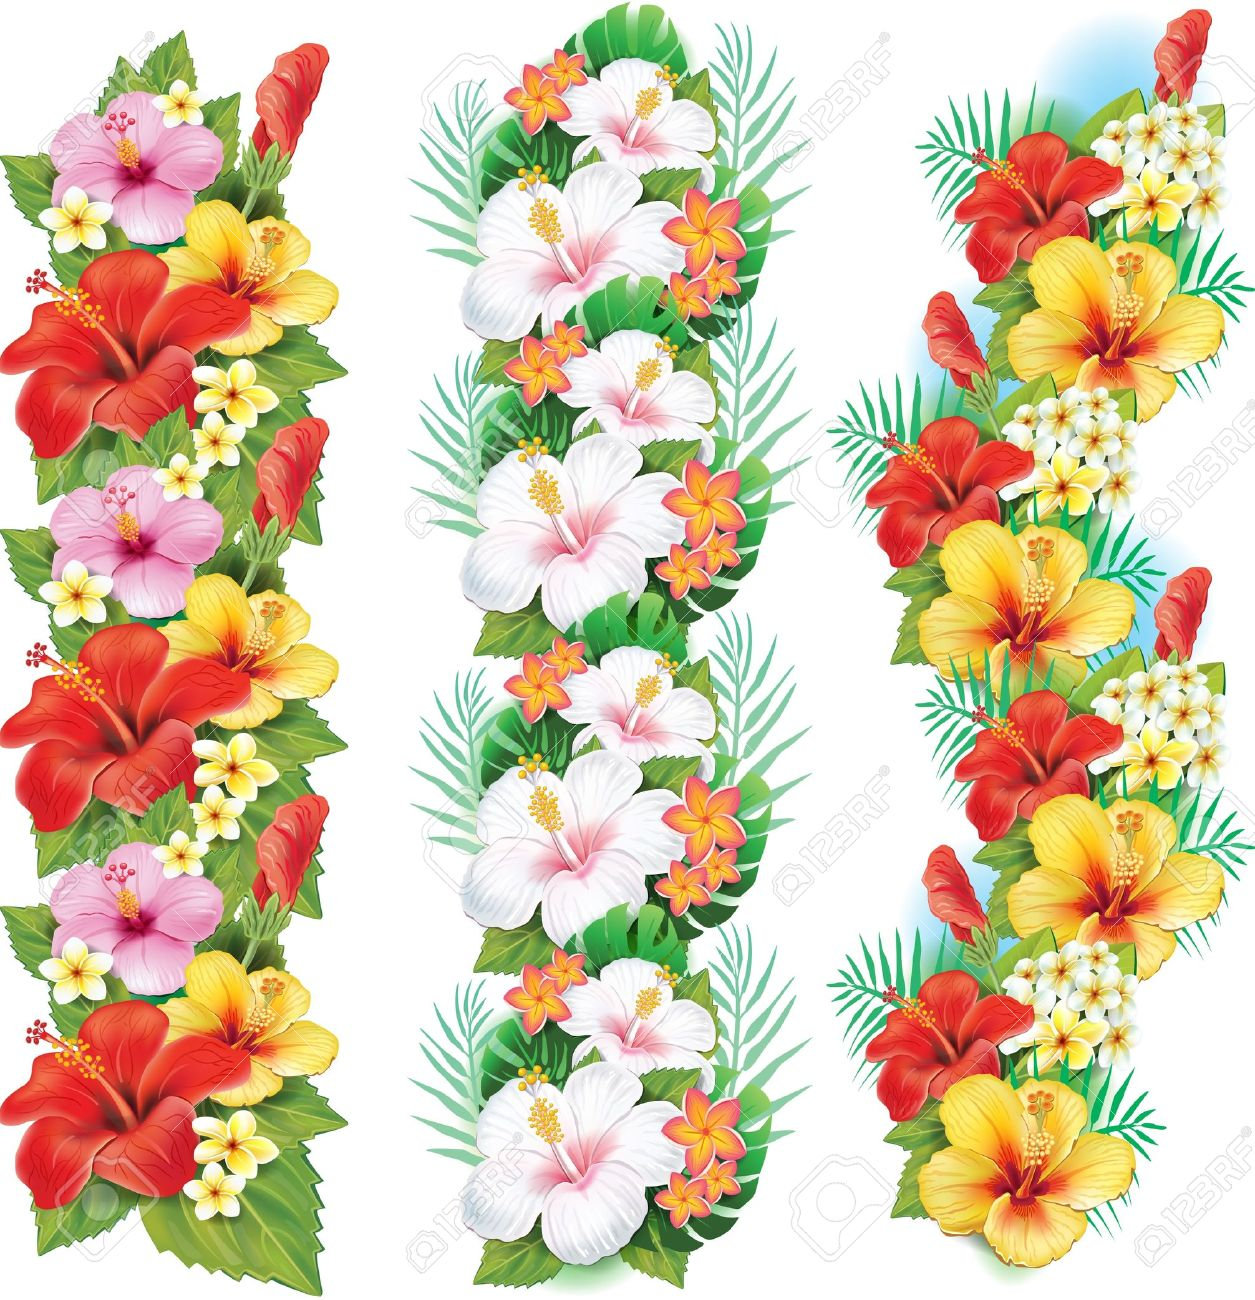 Garland of hibiscus flowers royalty free cliparts vectors and garland of hibiscus flowers stock vector 21670795 izmirmasajfo